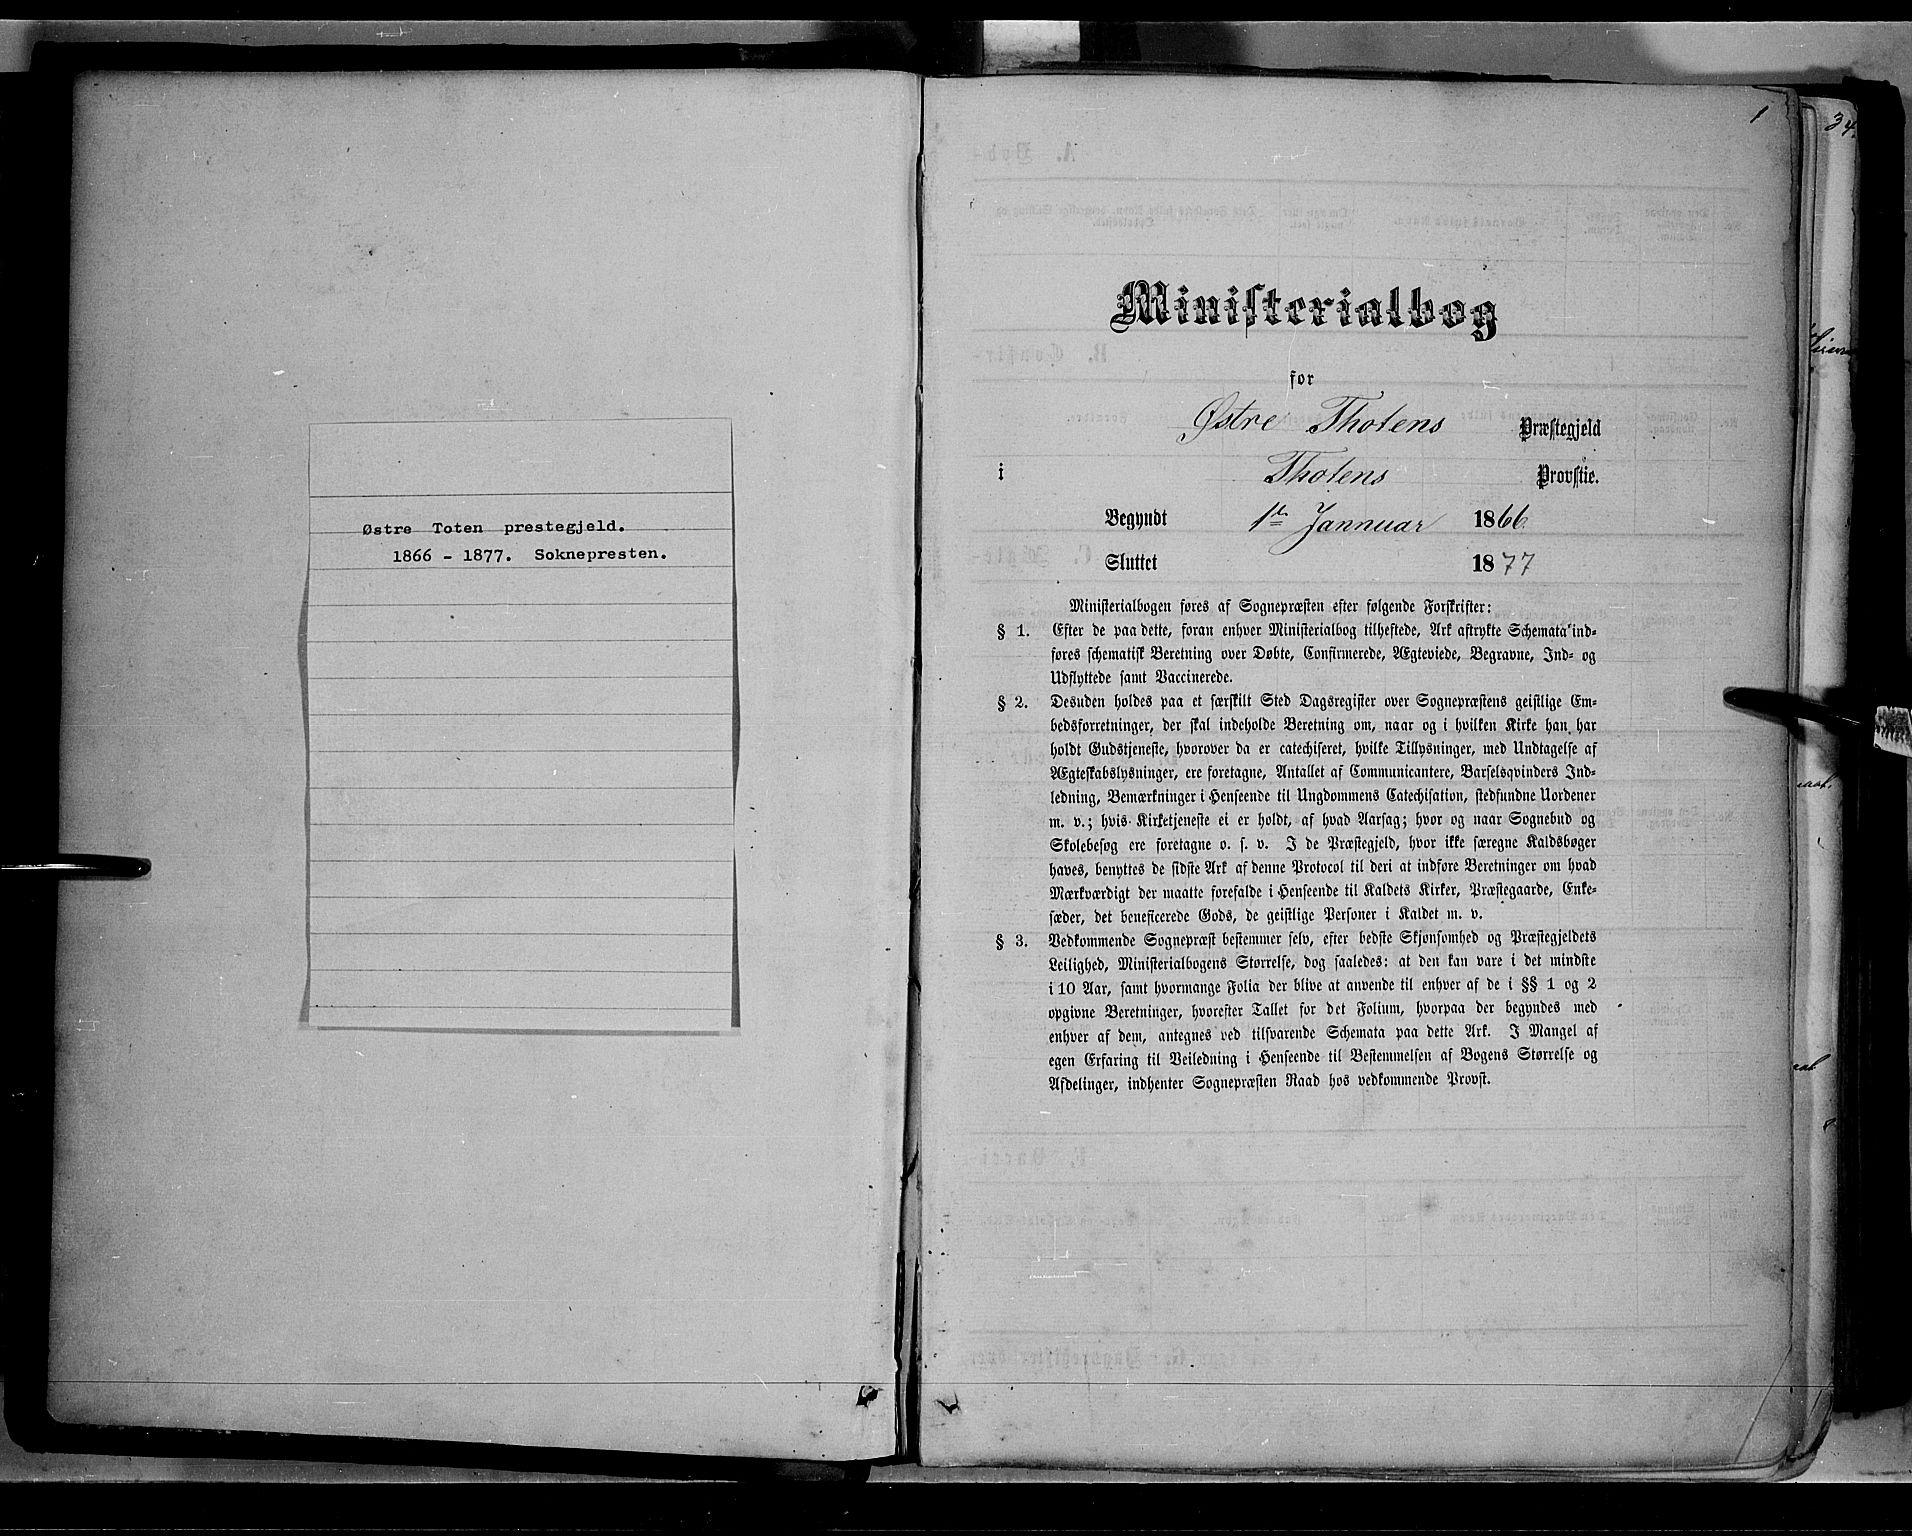 SAH, Østre Toten prestekontor, Ministerialbok nr. 5, 1866-1877, s. 1